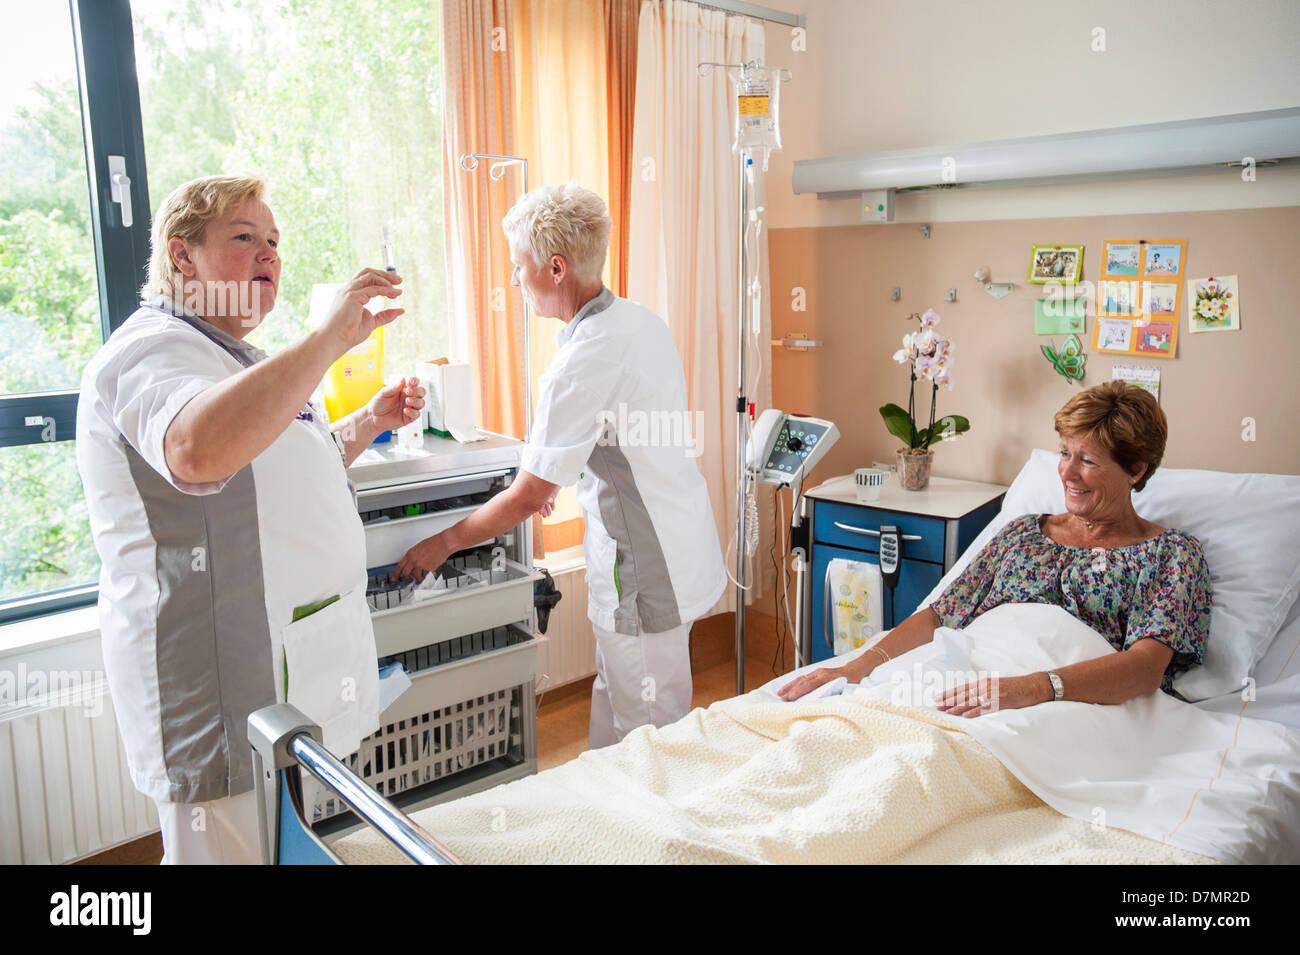 Nurses preparing medication - Stock Image